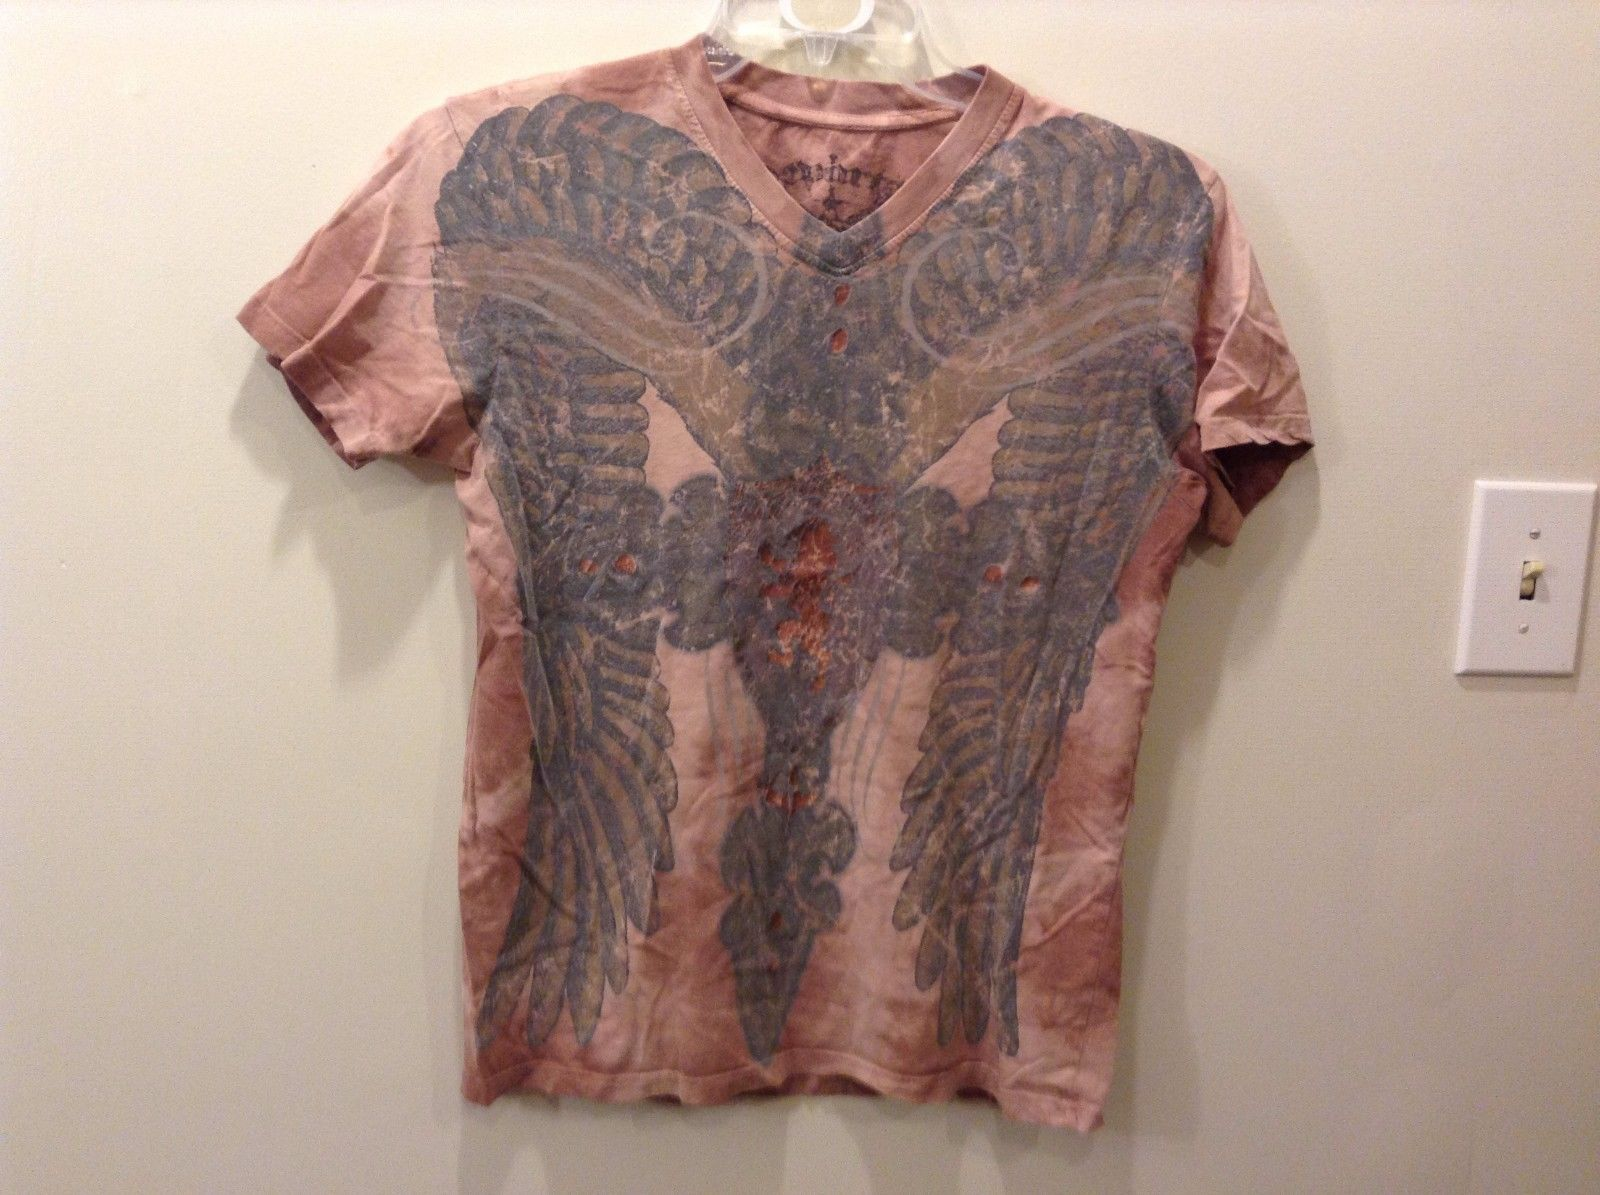 Mens Denarten Faded Deep Pink Tie dye T Shirt w Cracked Eagle Dragon Design Sz M